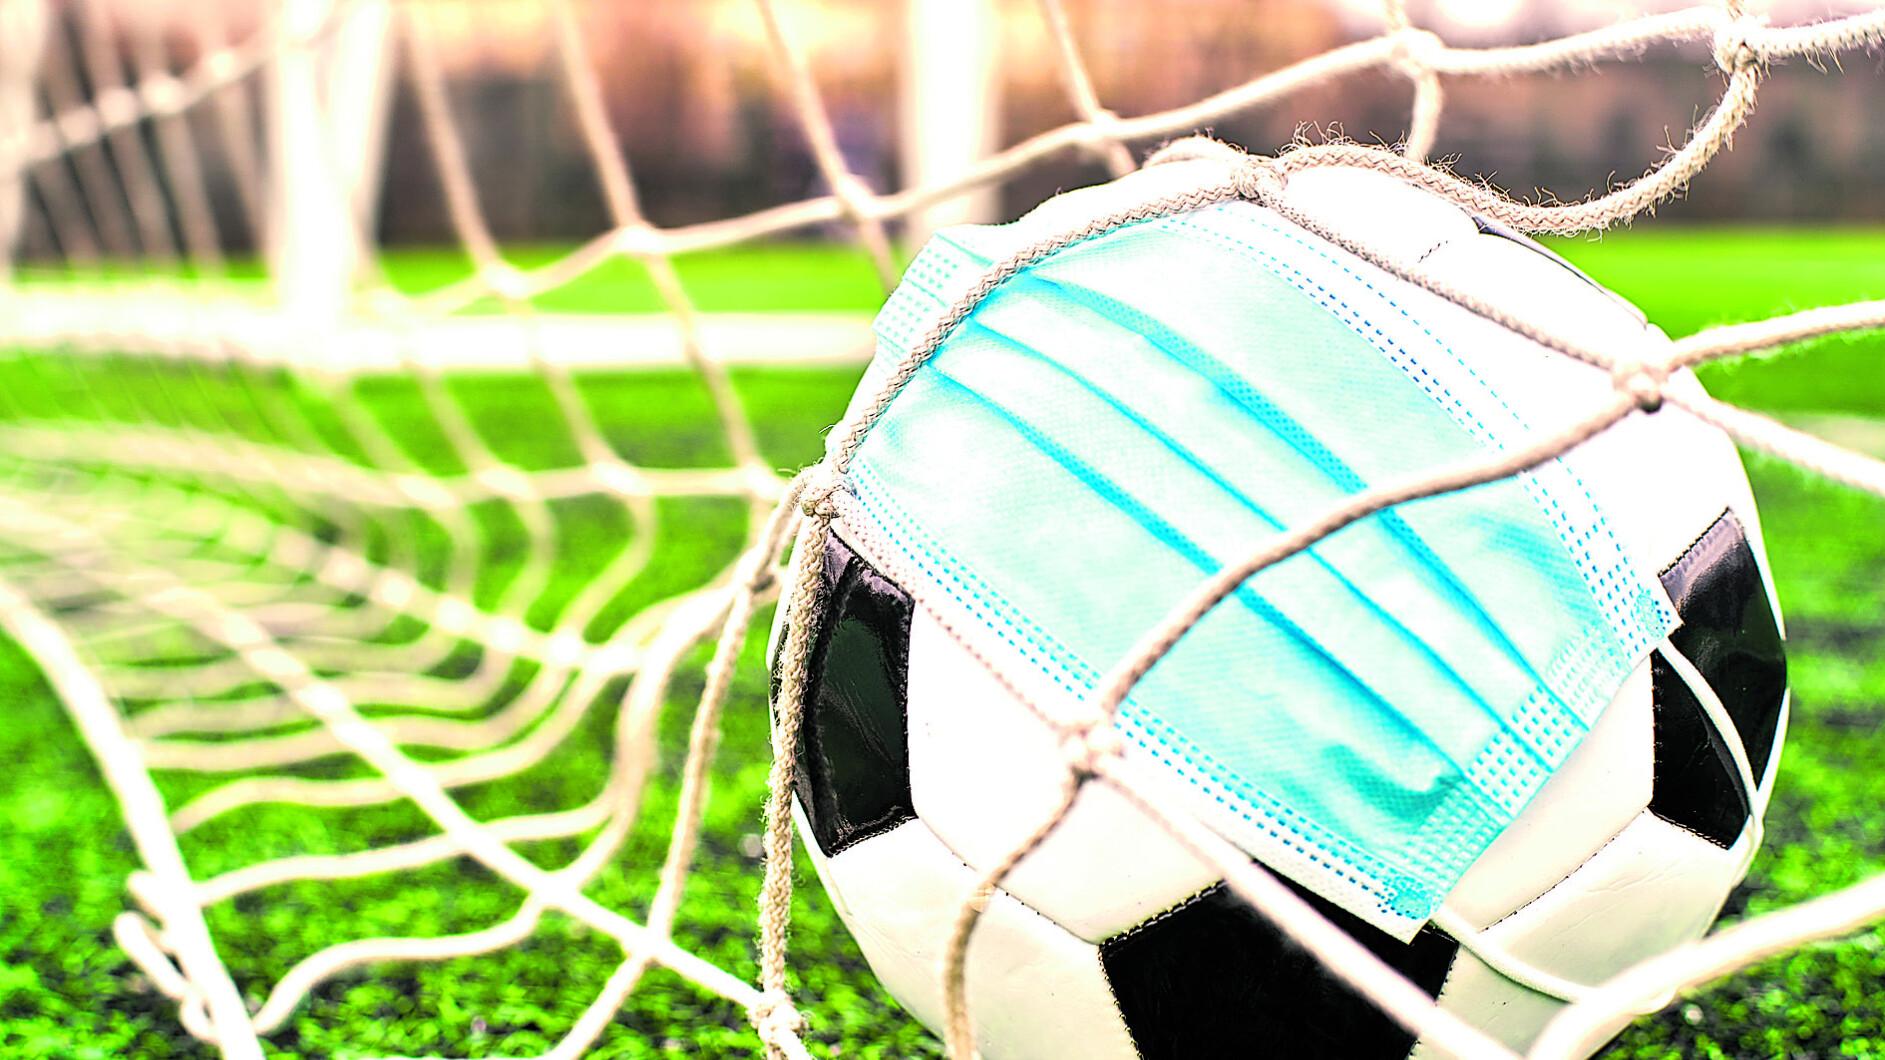 Fu-ball-Kompakt-Trotz-Pandemie-Dynamik-fehlt-